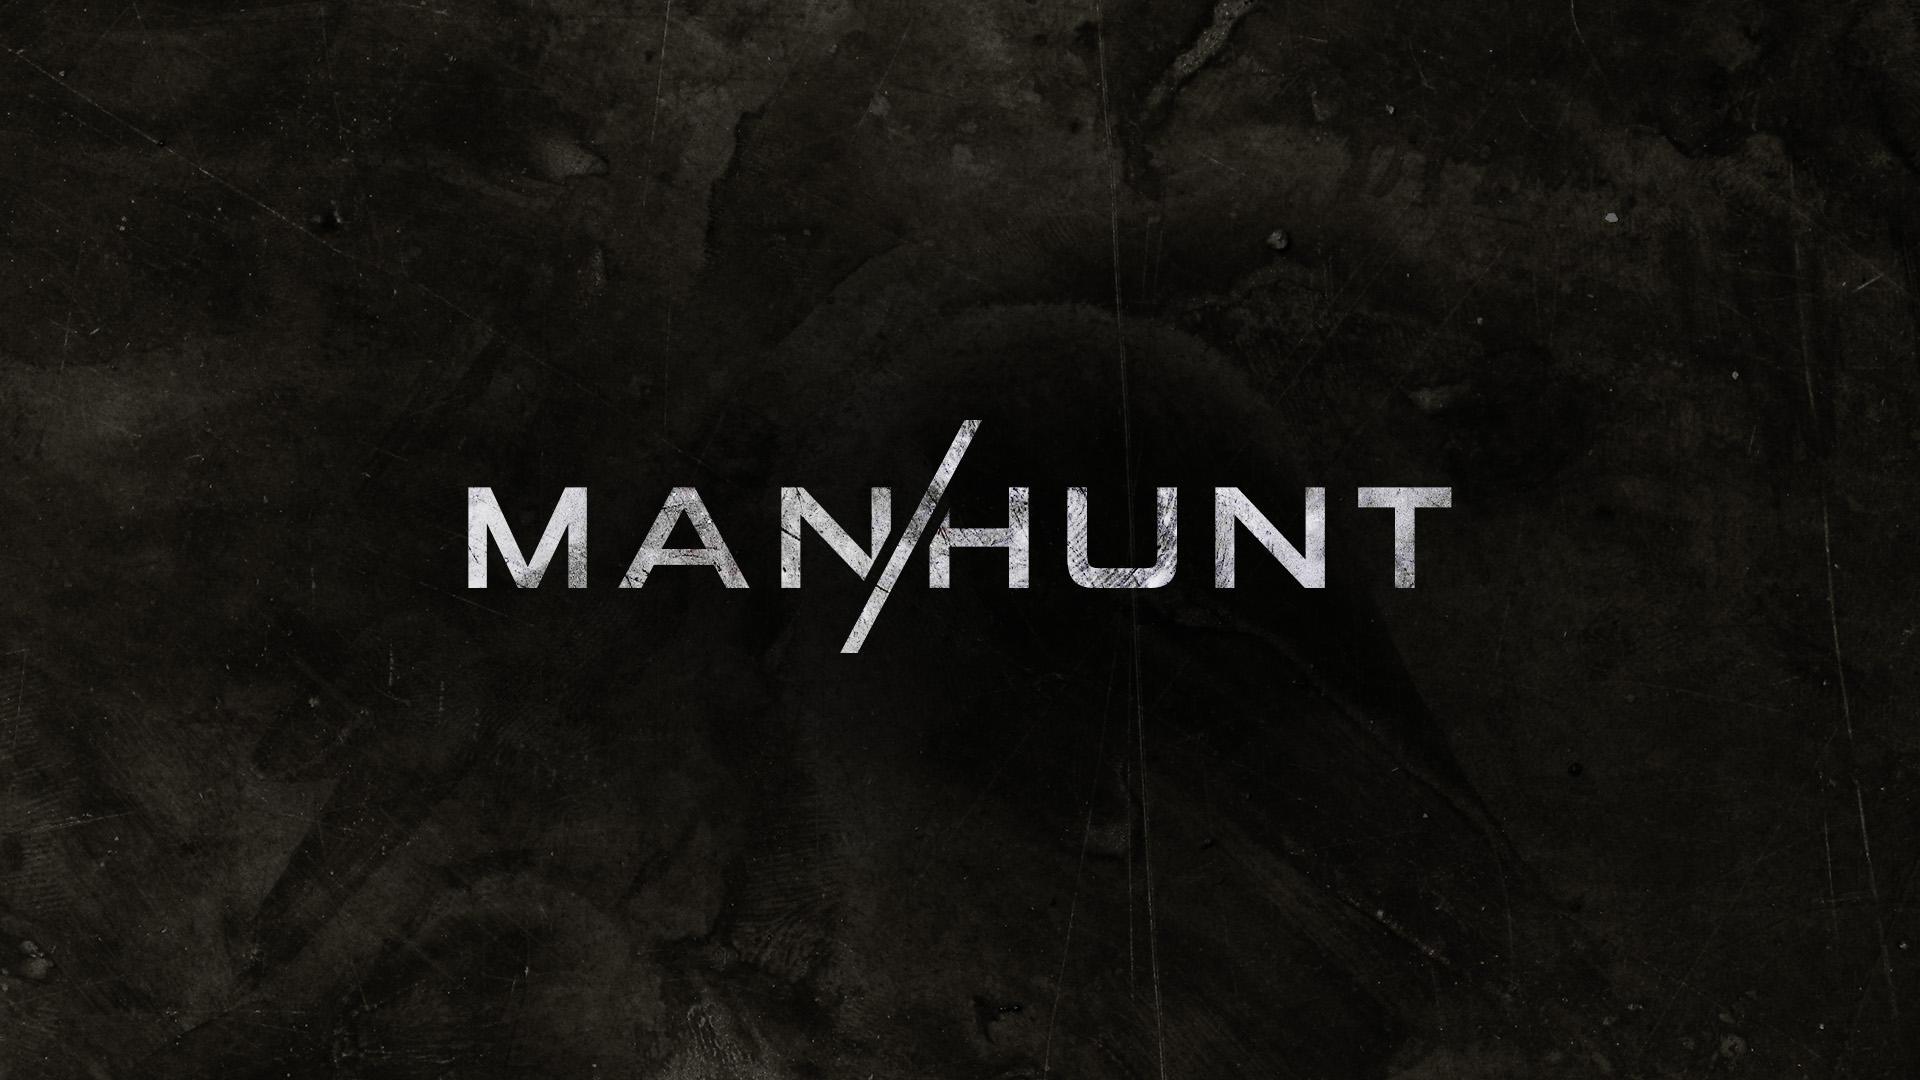 xManhunt_V2_6.jpg